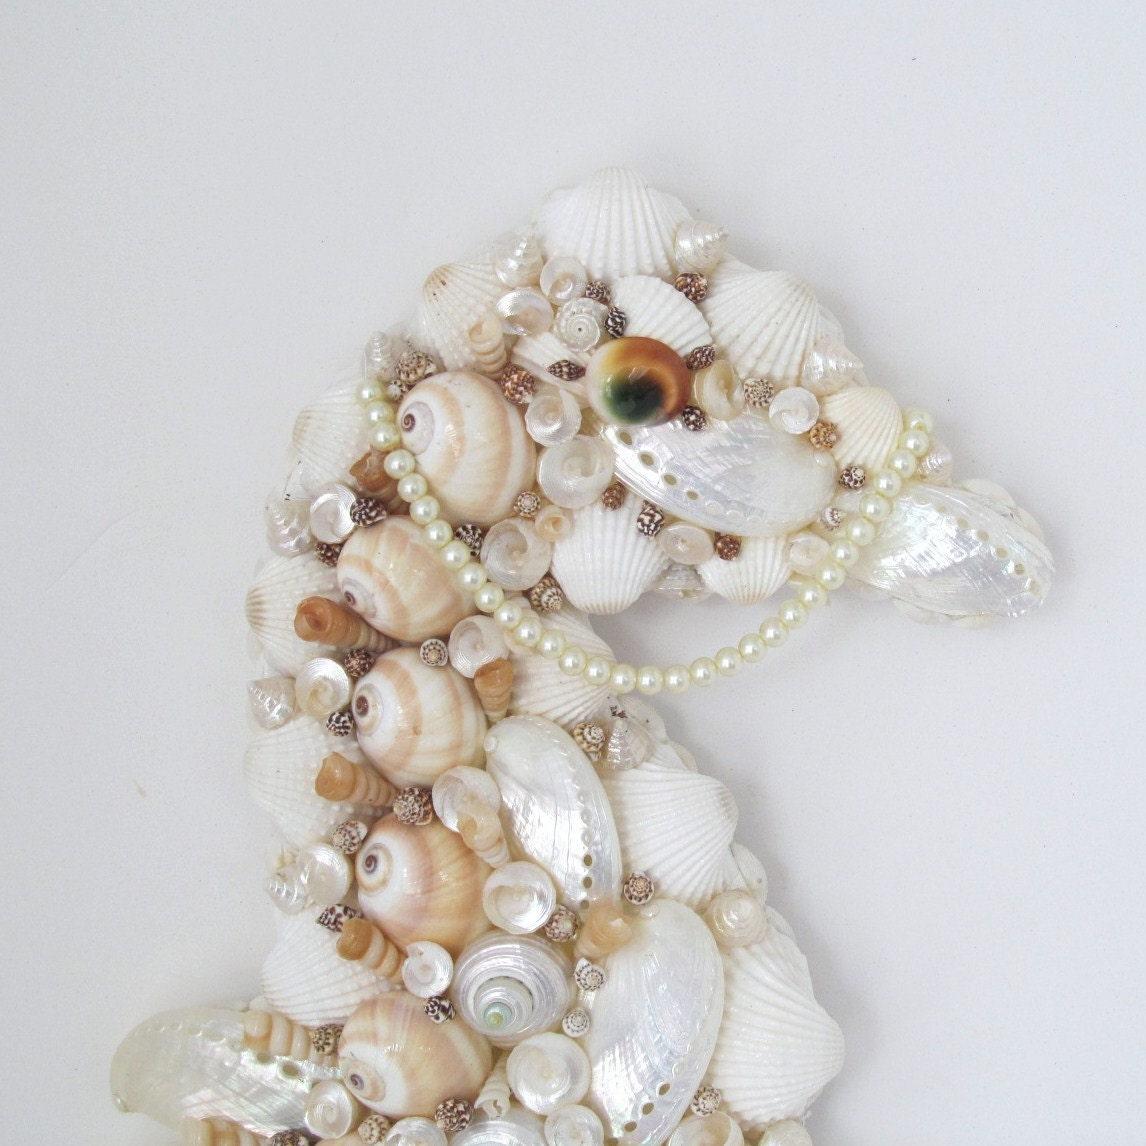 Seahorse art wall decor seashells by sandisshellscapes on etsy for Seashell decor